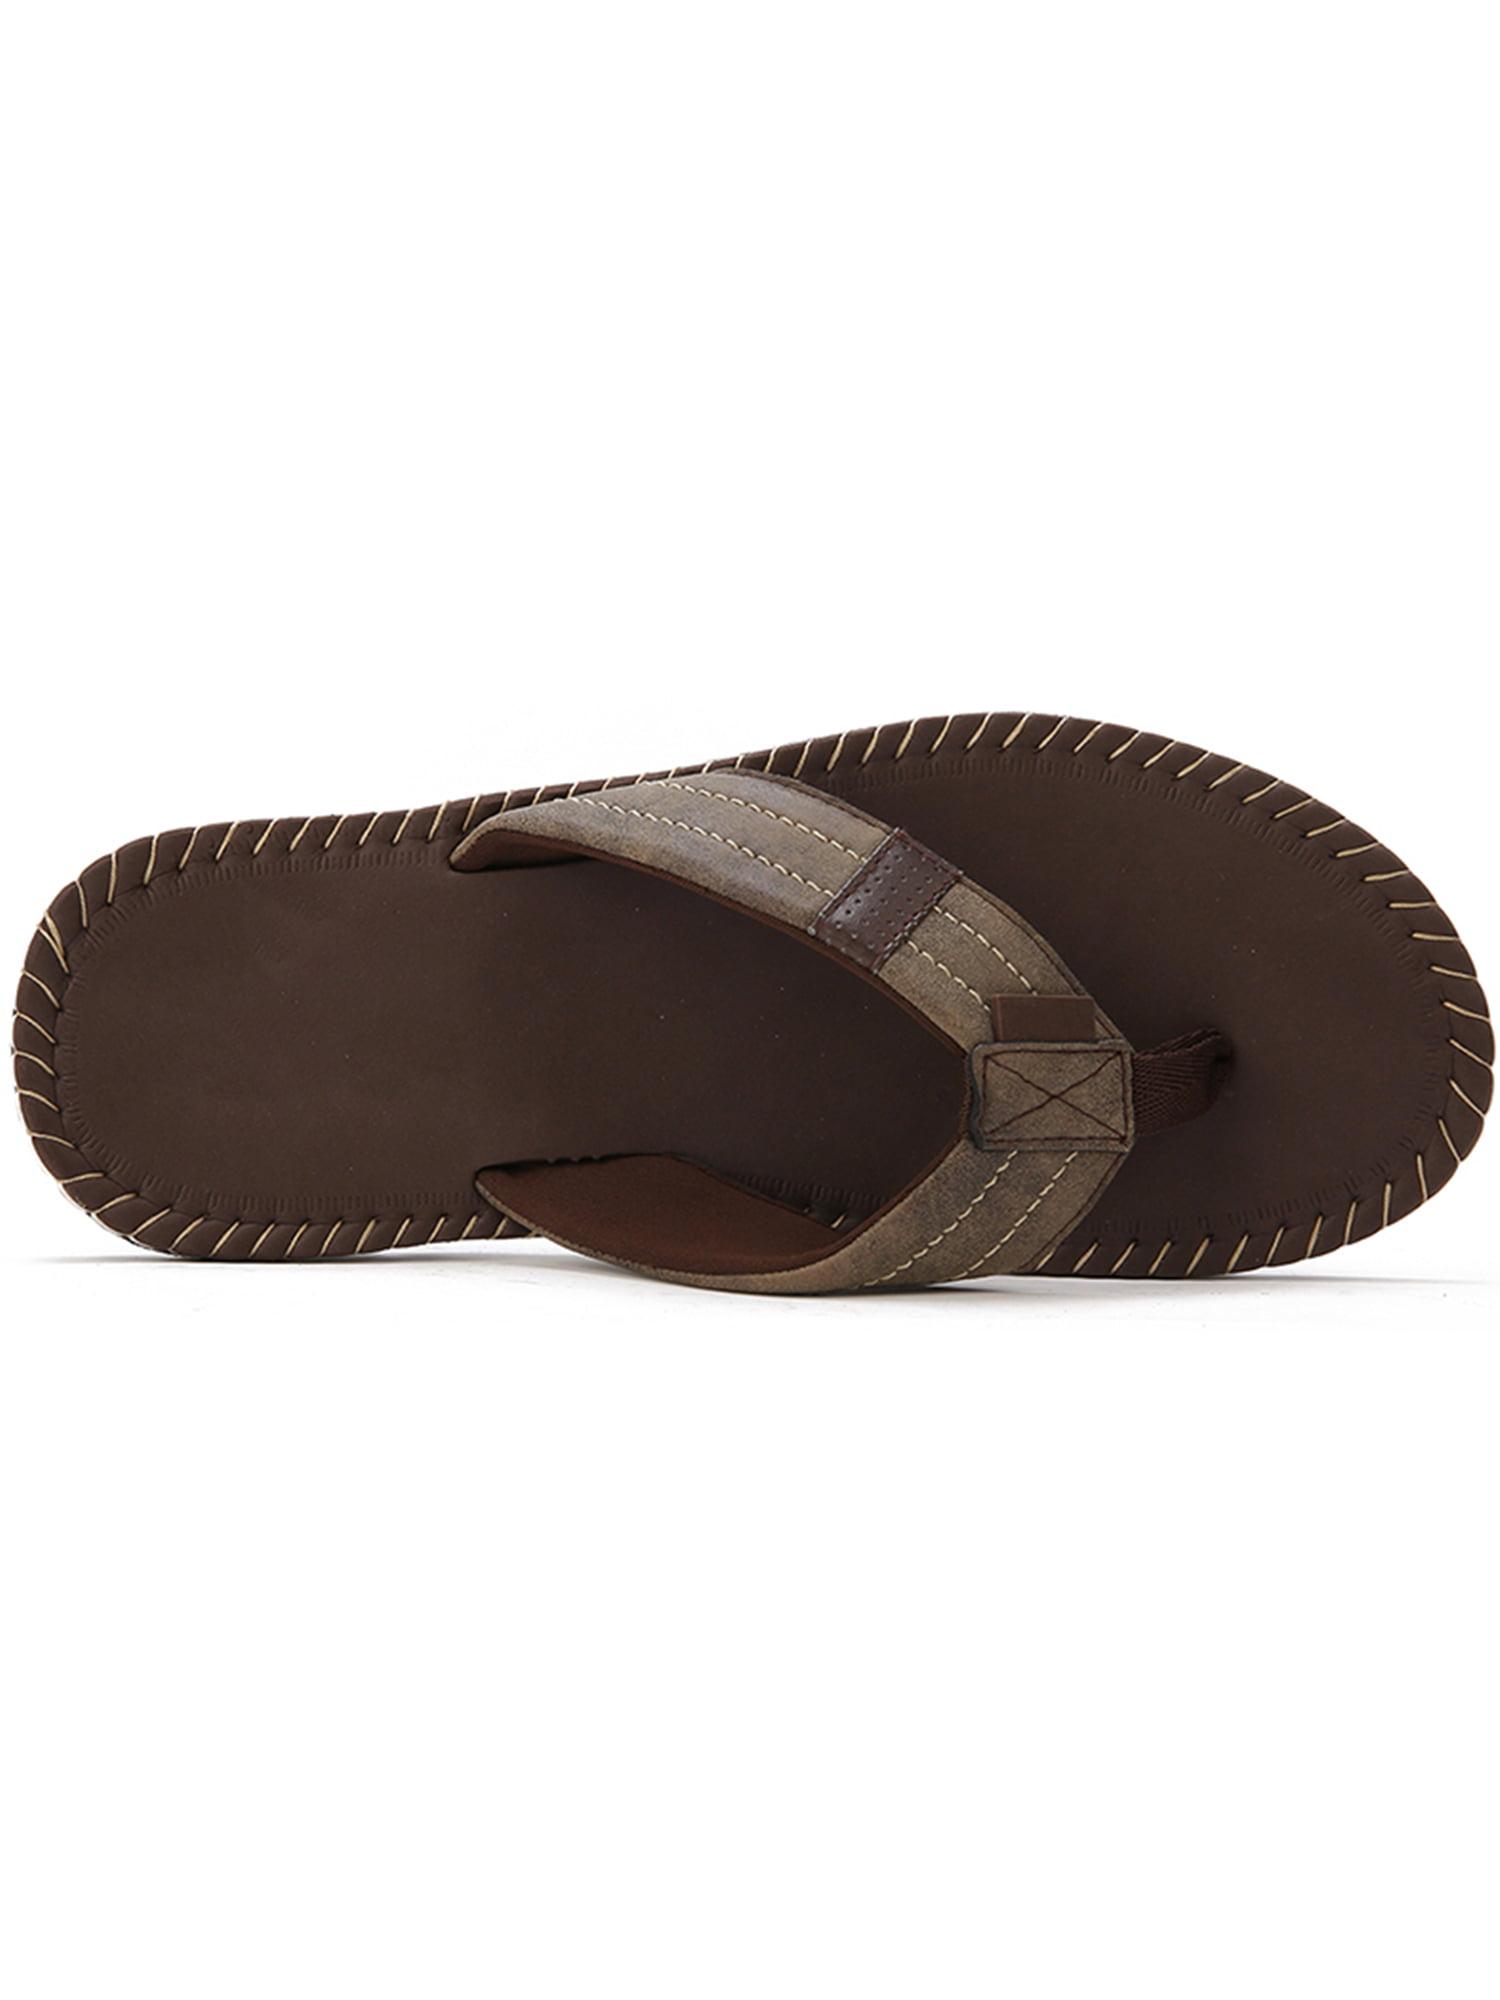 ebcb4ded302f Tanleewa - Men s Flip Flop Summer Holiday Thong Sandals Comfort Lightweight  Beach Travel Slippers Big Size - Walmart.com